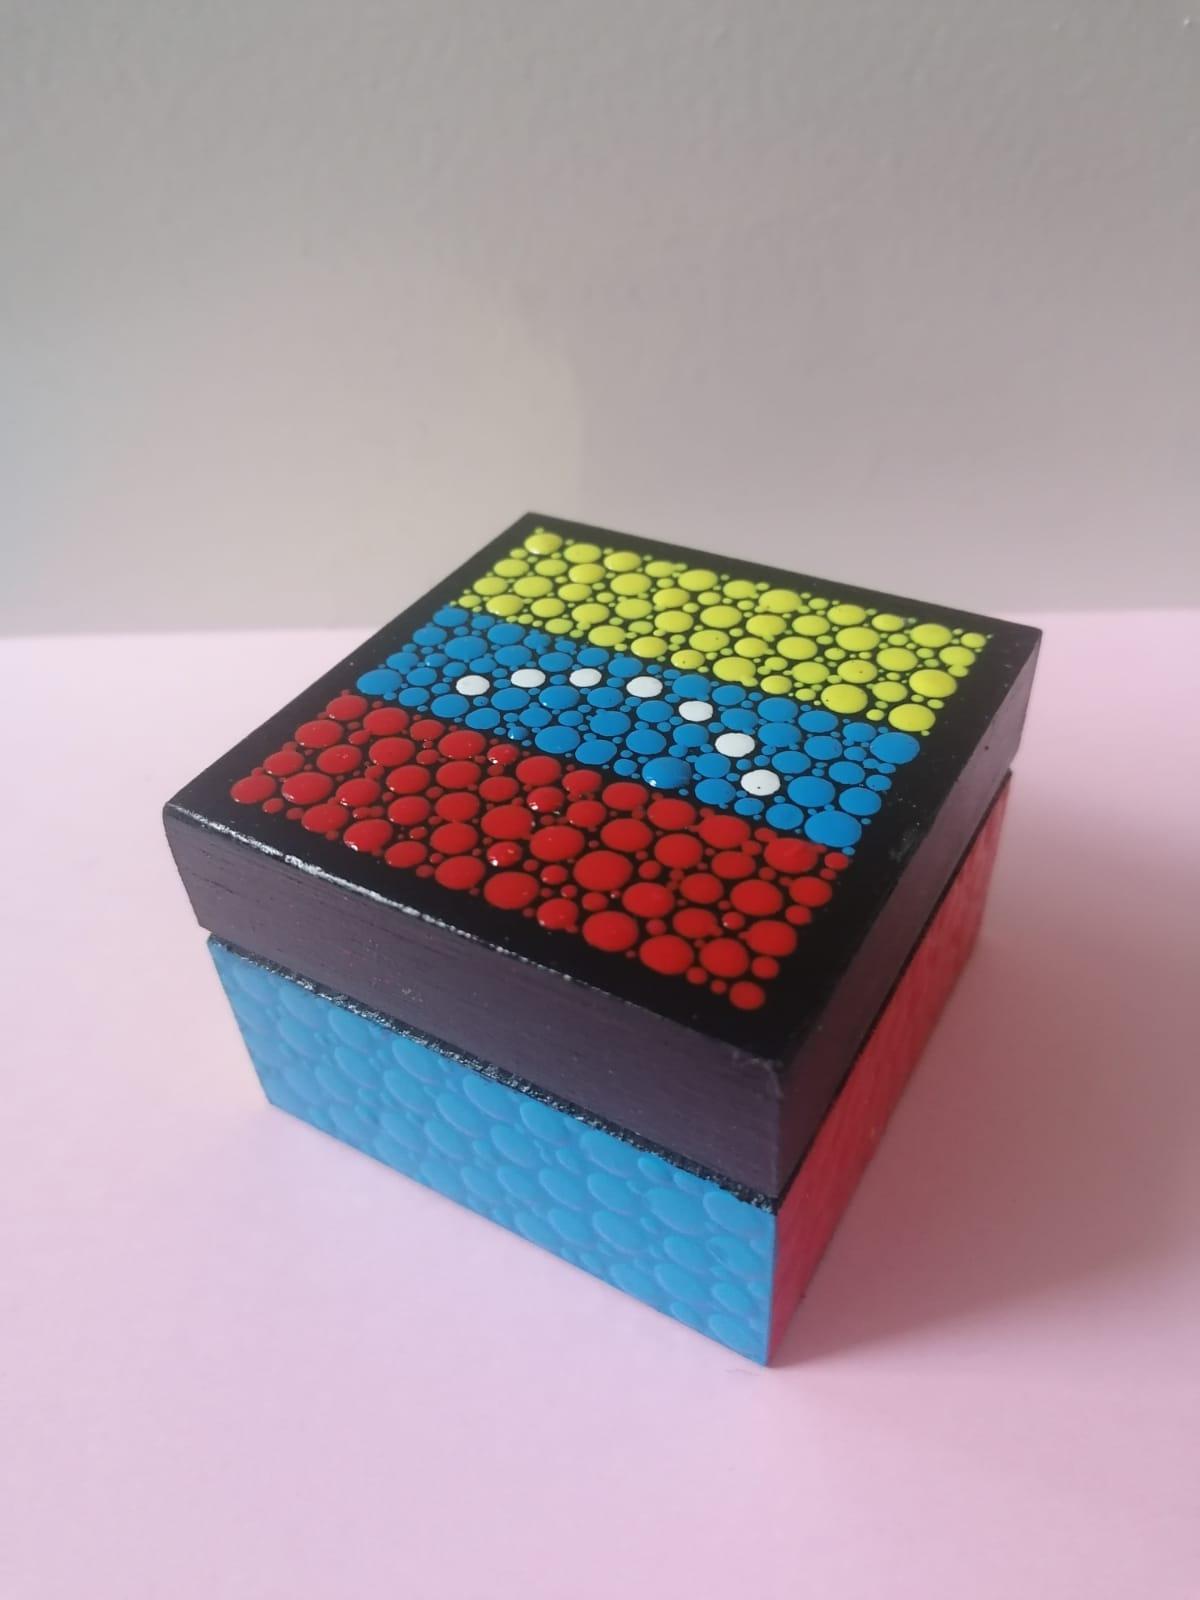 Venezuelan mini-boxes